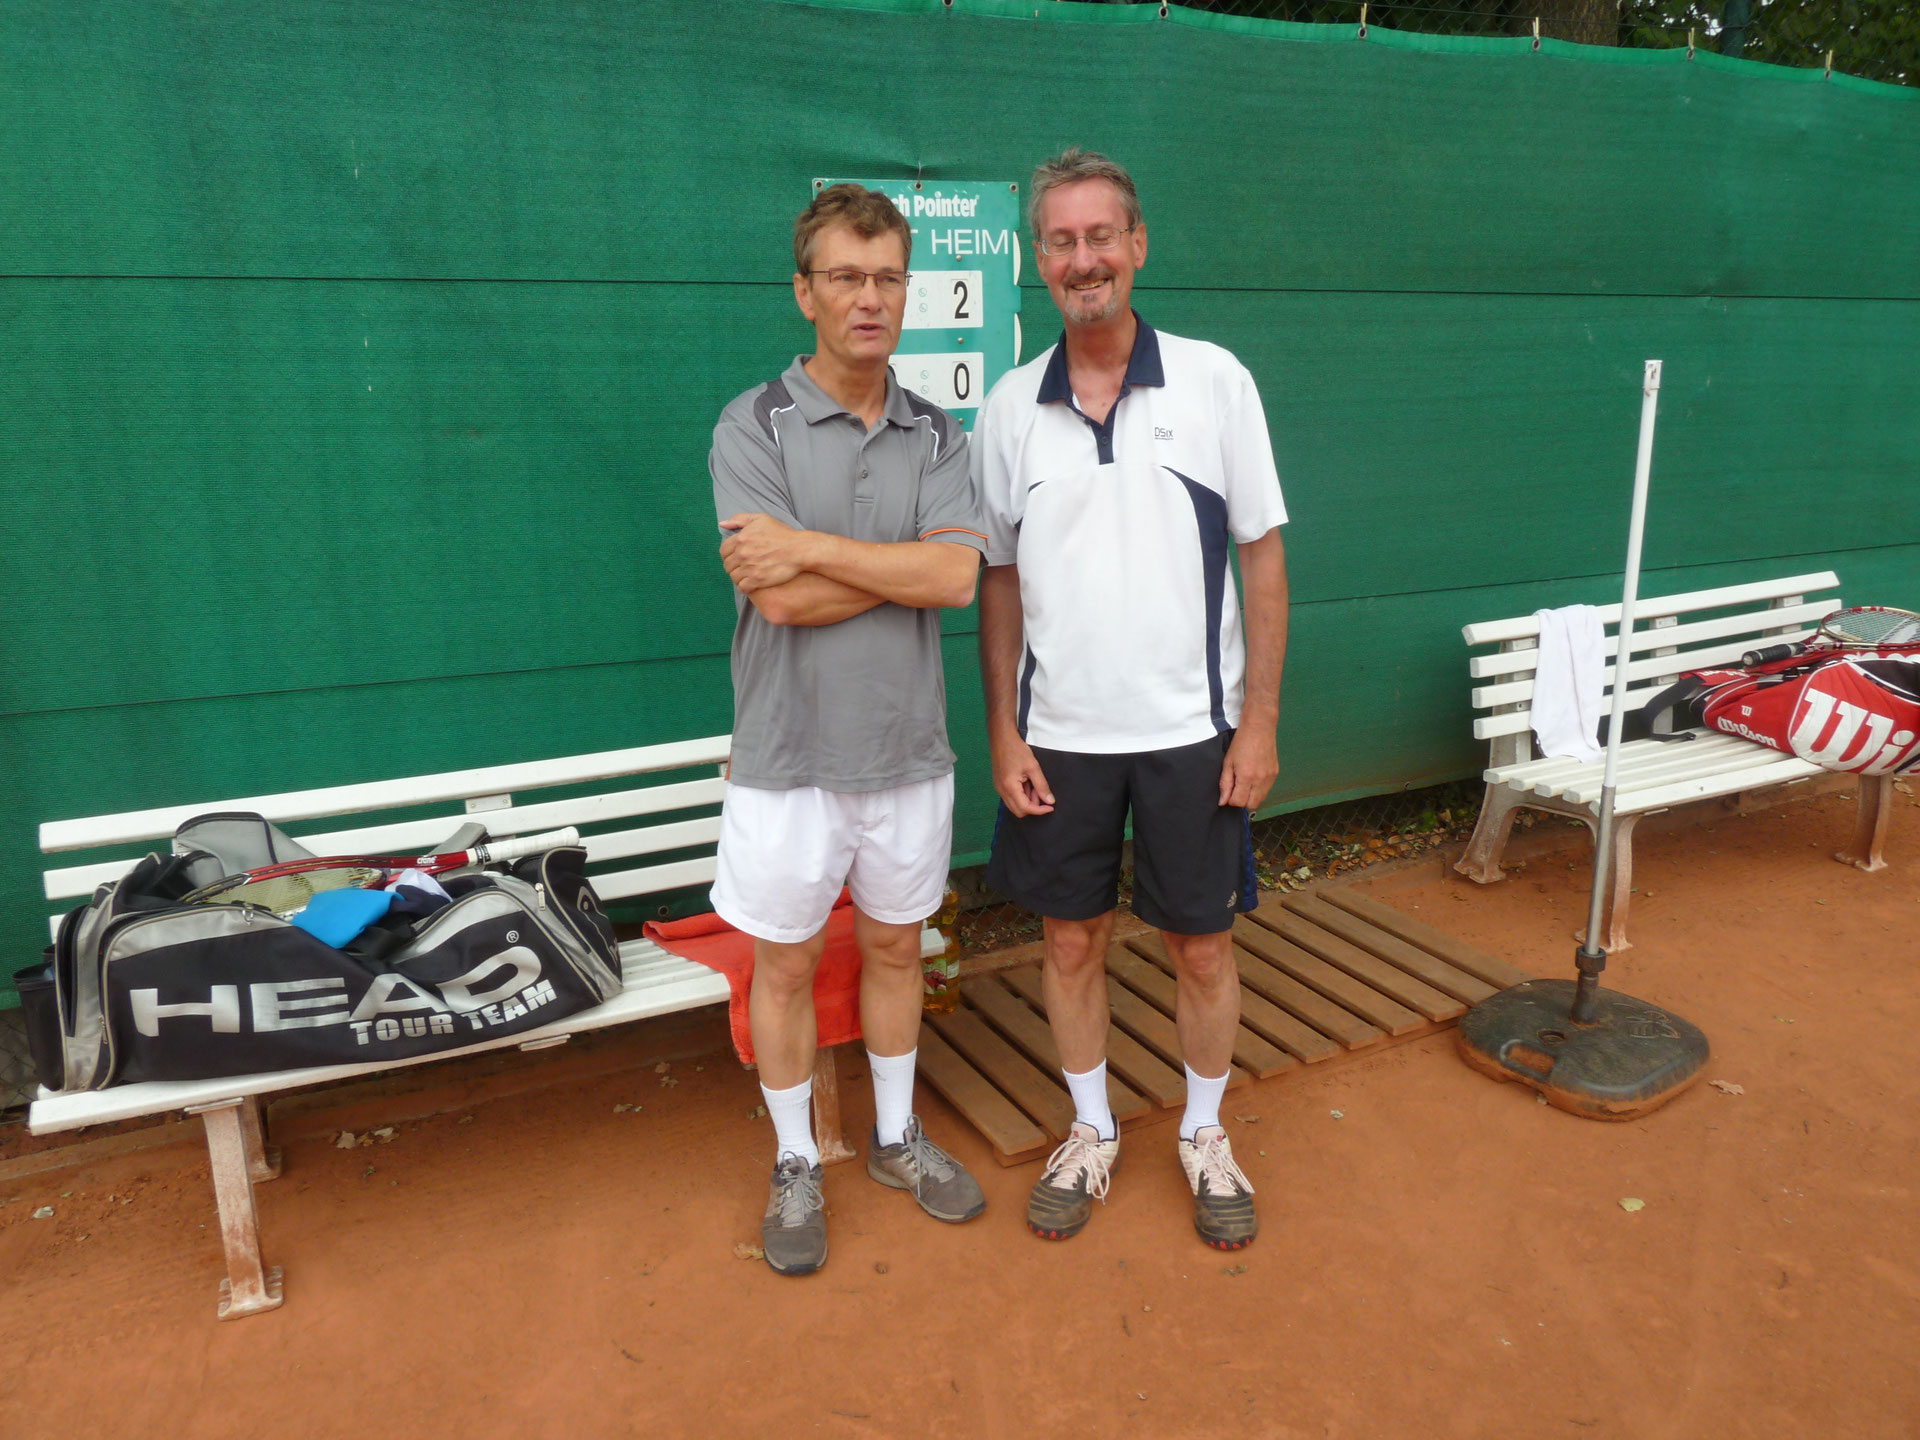 Tennis In Bottrop